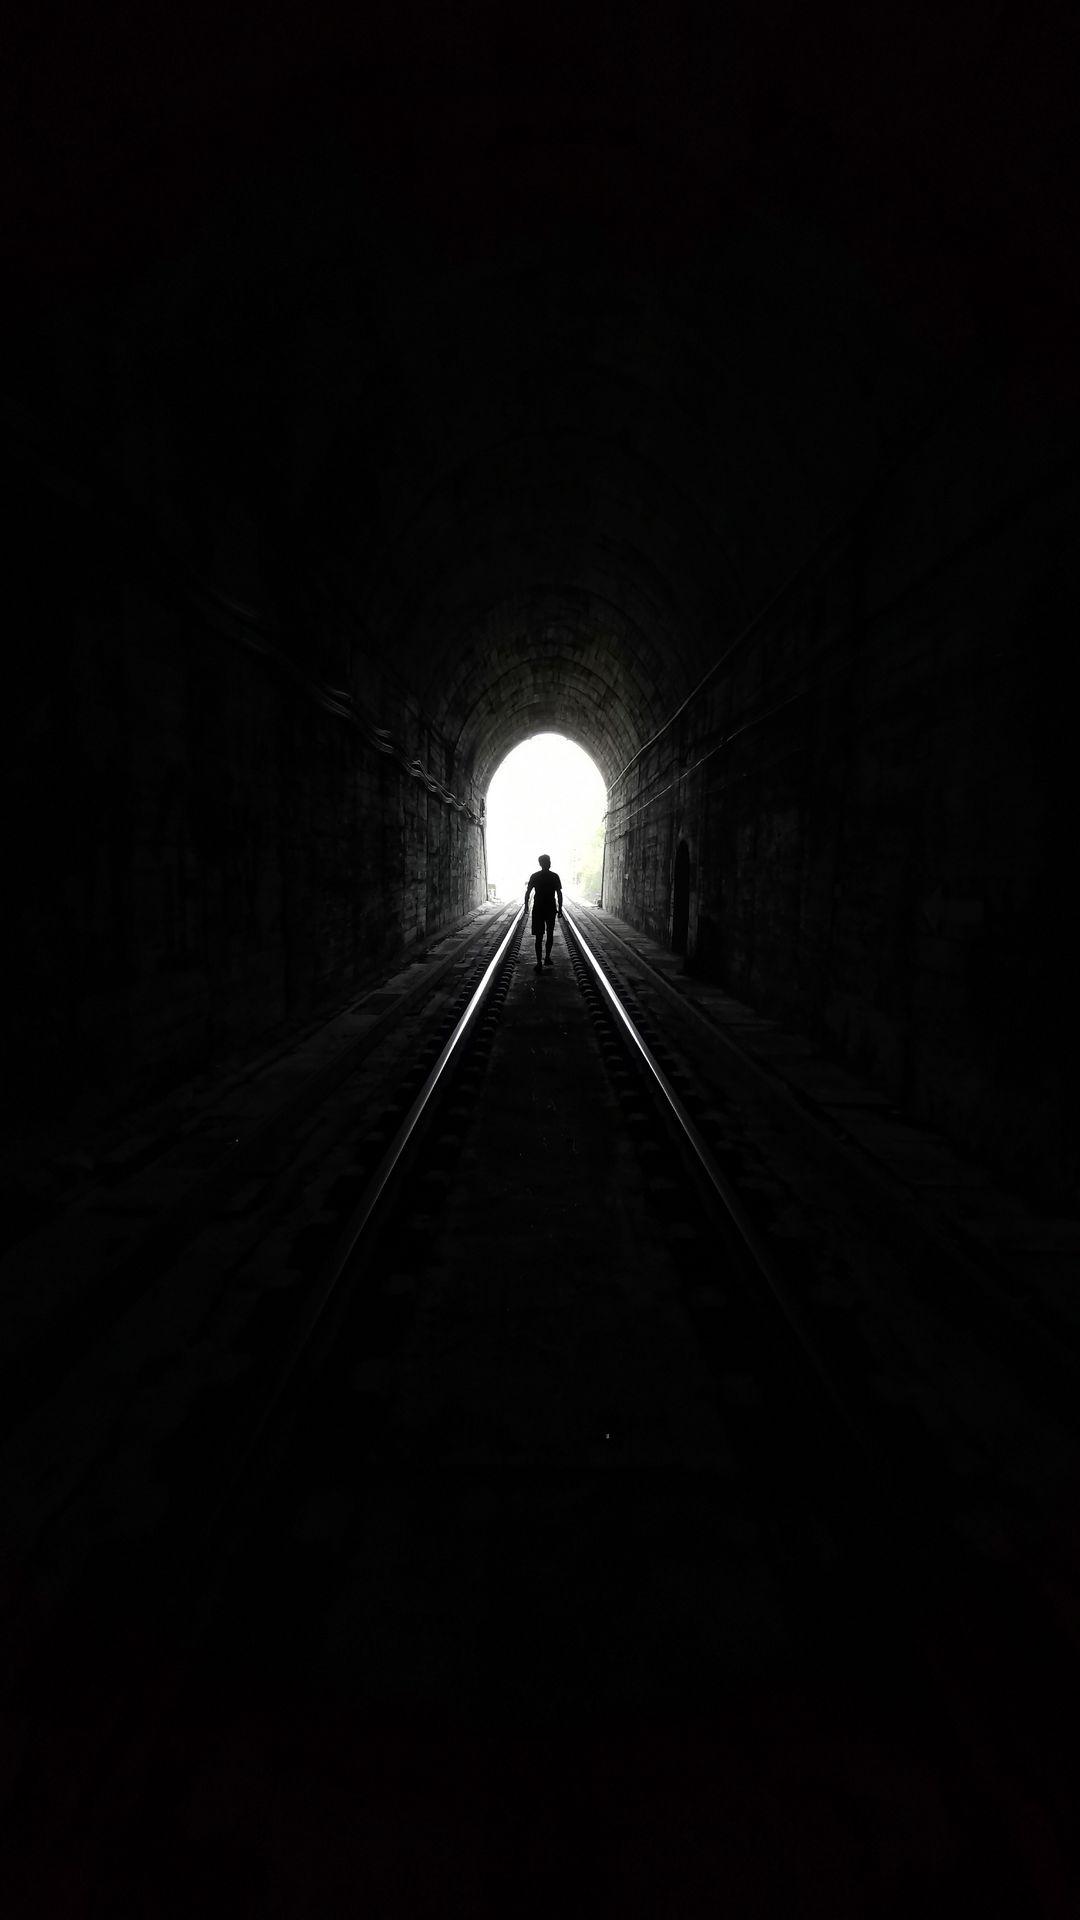 Wallpaper Alone Man Silhouette Dark Tunnel